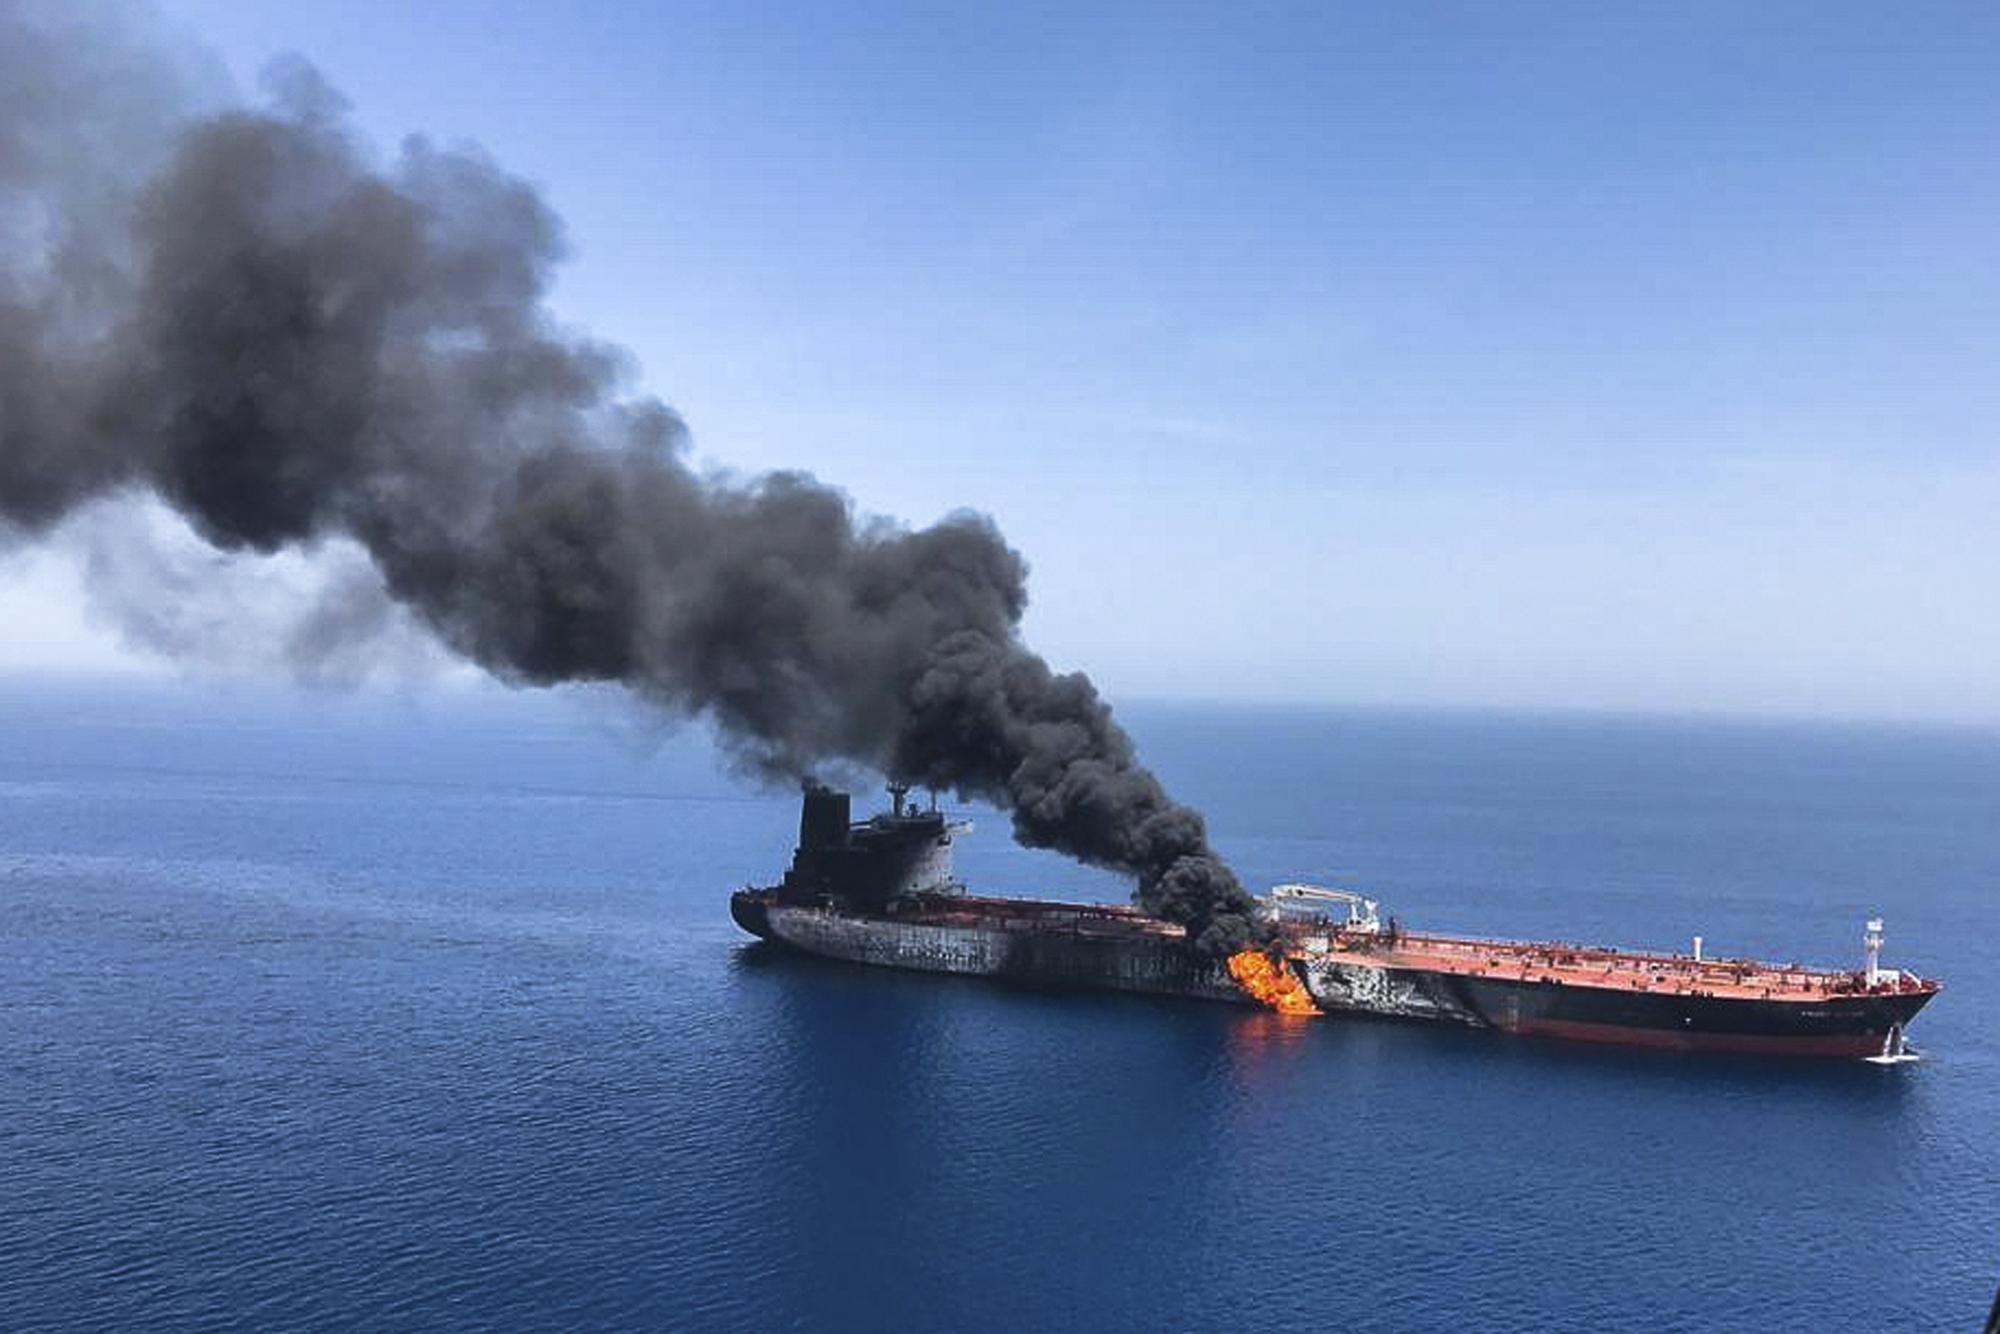 Iran_Persian_Gulf_Tensions_24956-159532.jpg40855771